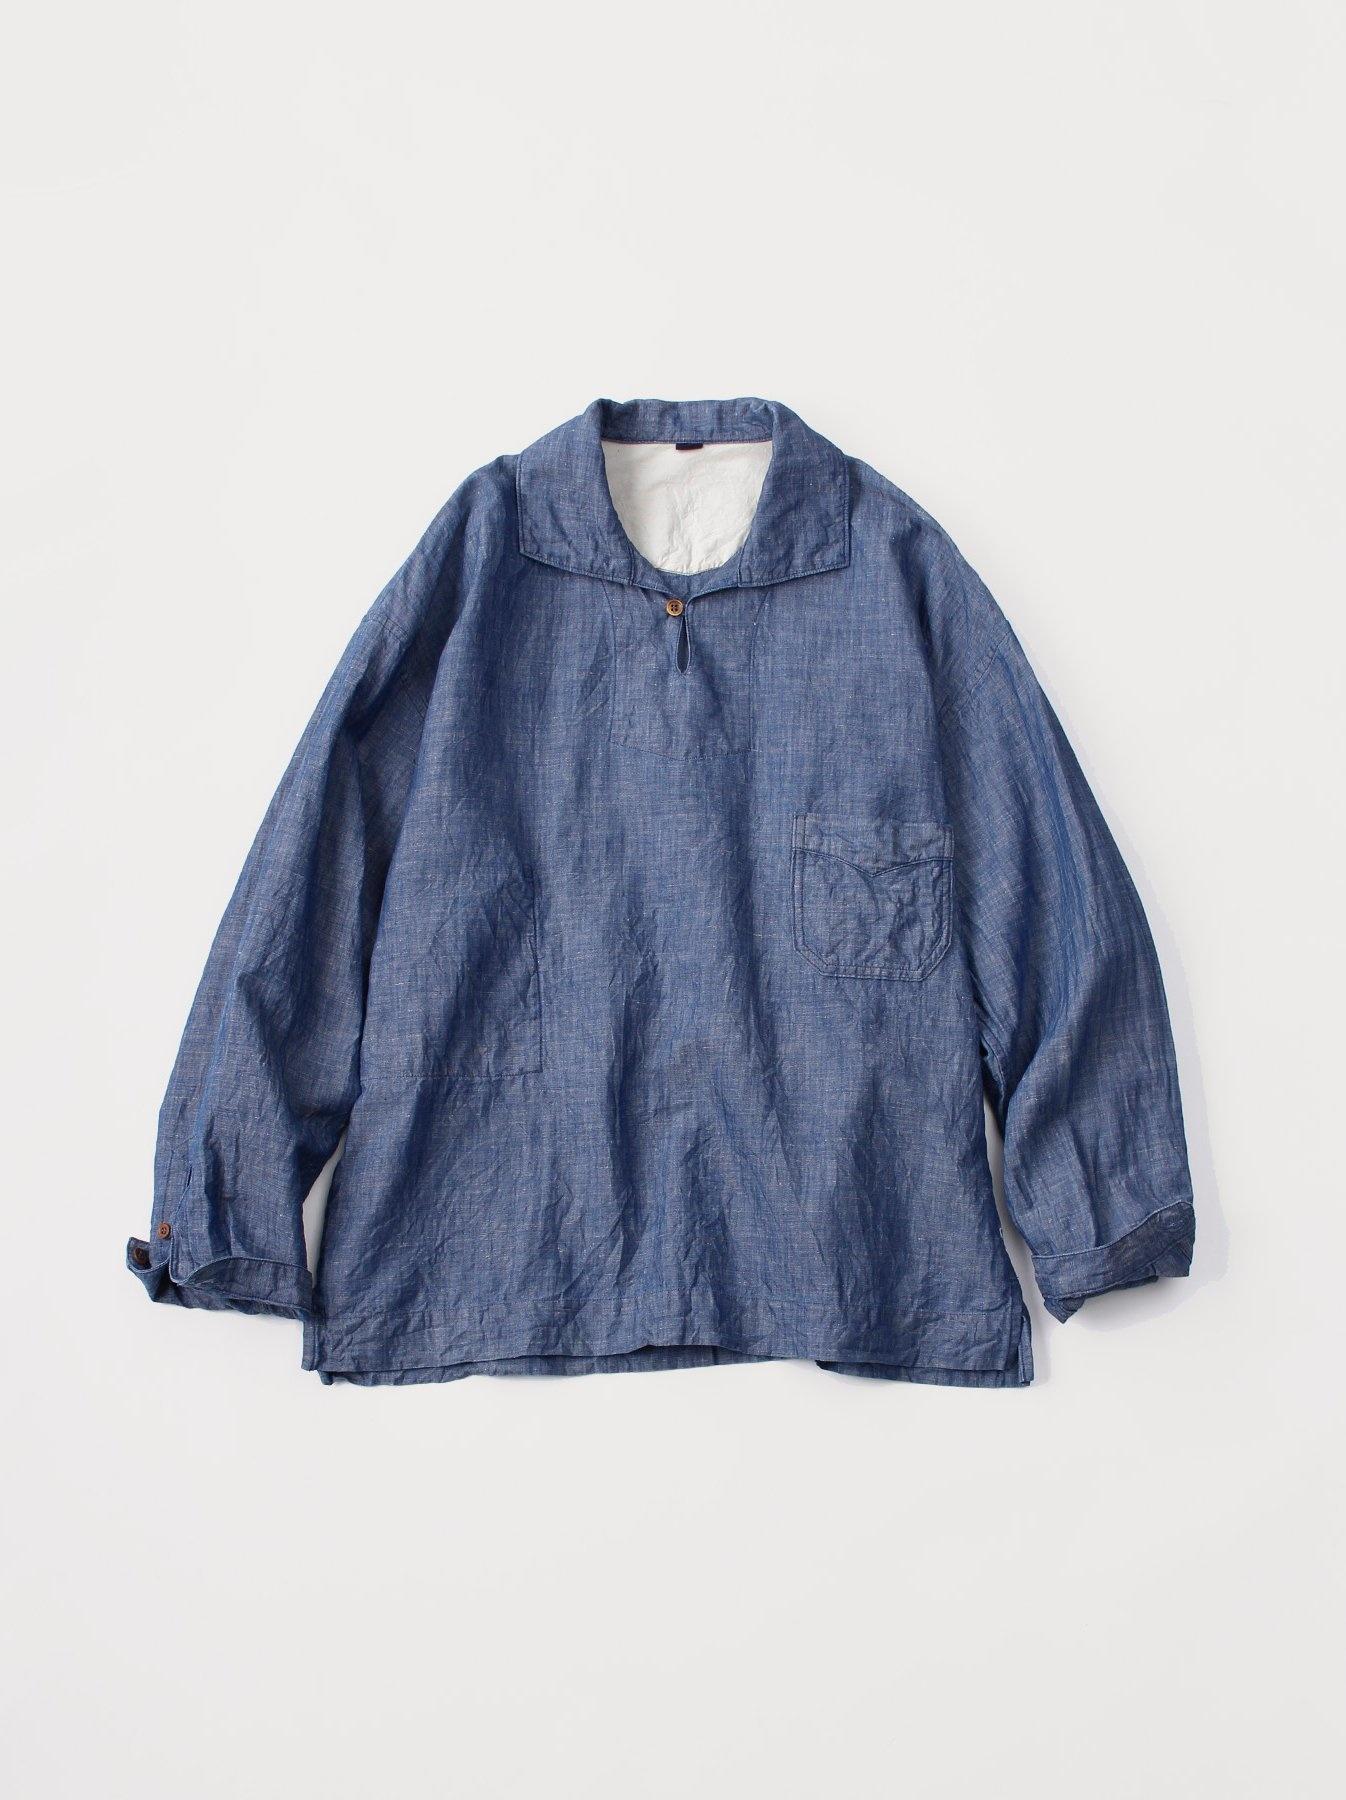 WH Cotton Linen Umahiko Pullover Shirt-1